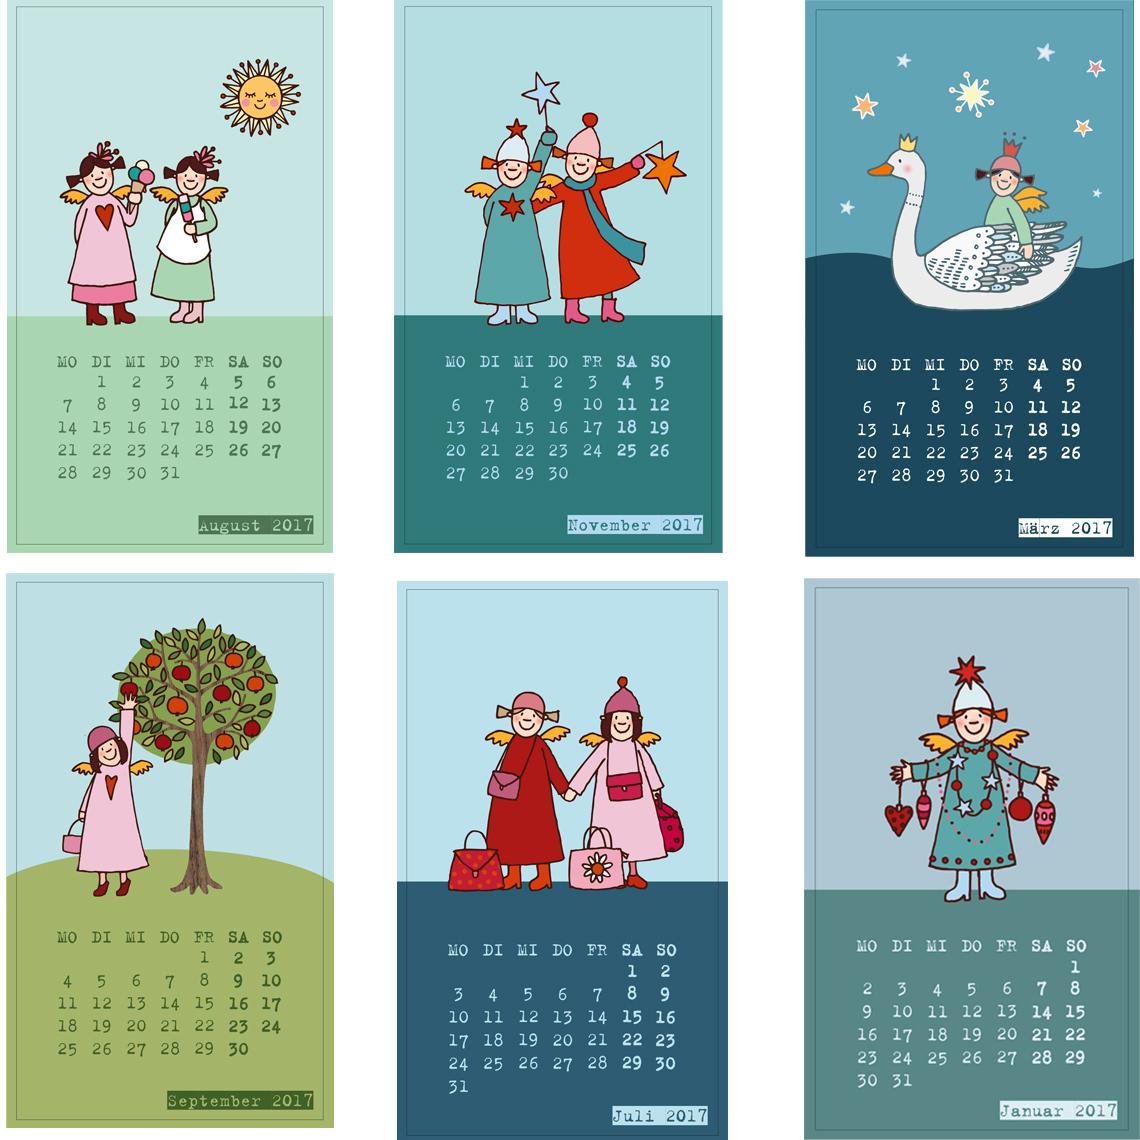 89184_kalender_2(1)